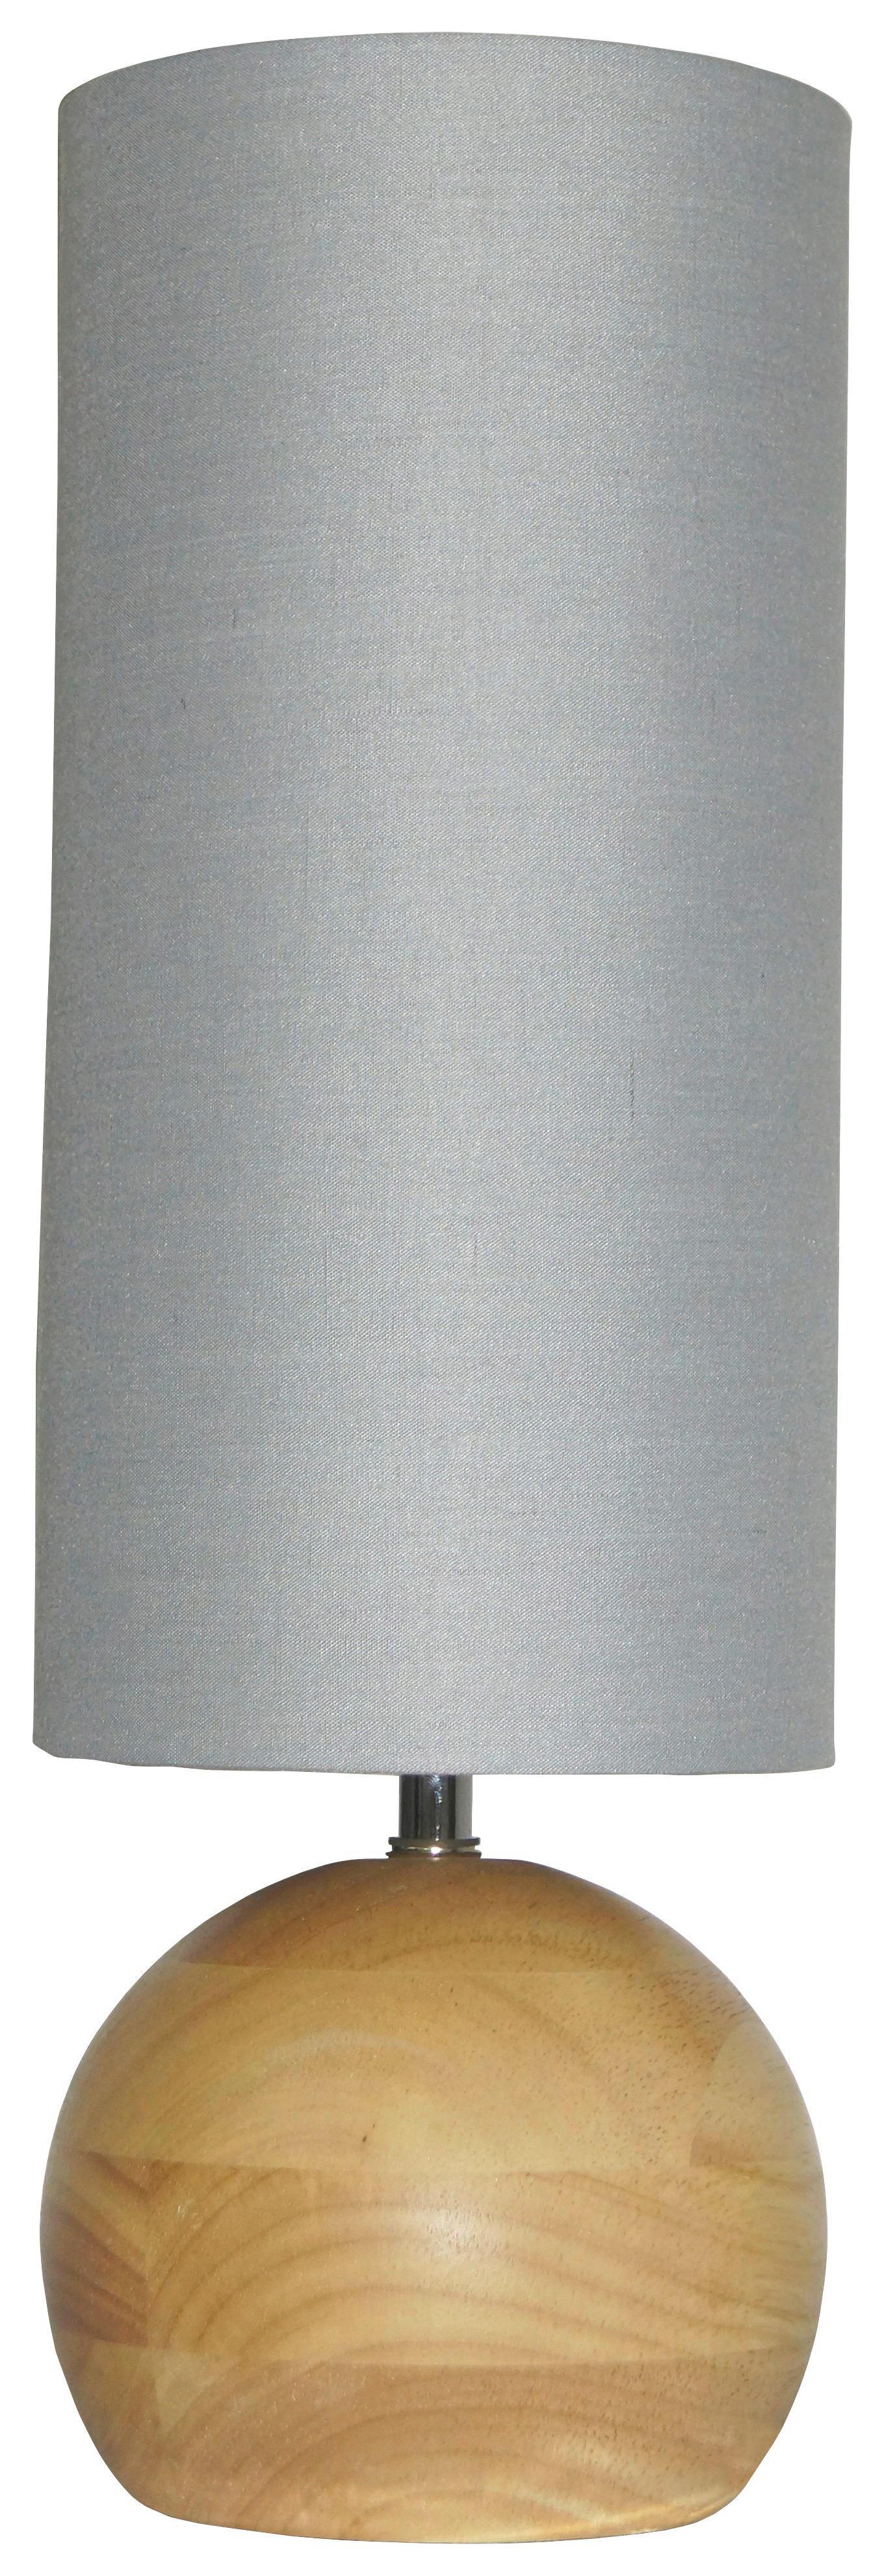 TISCHLEUCHTE - Grau/Kieferfarben, LIFESTYLE, Holz/Textil (12/37/12cm)